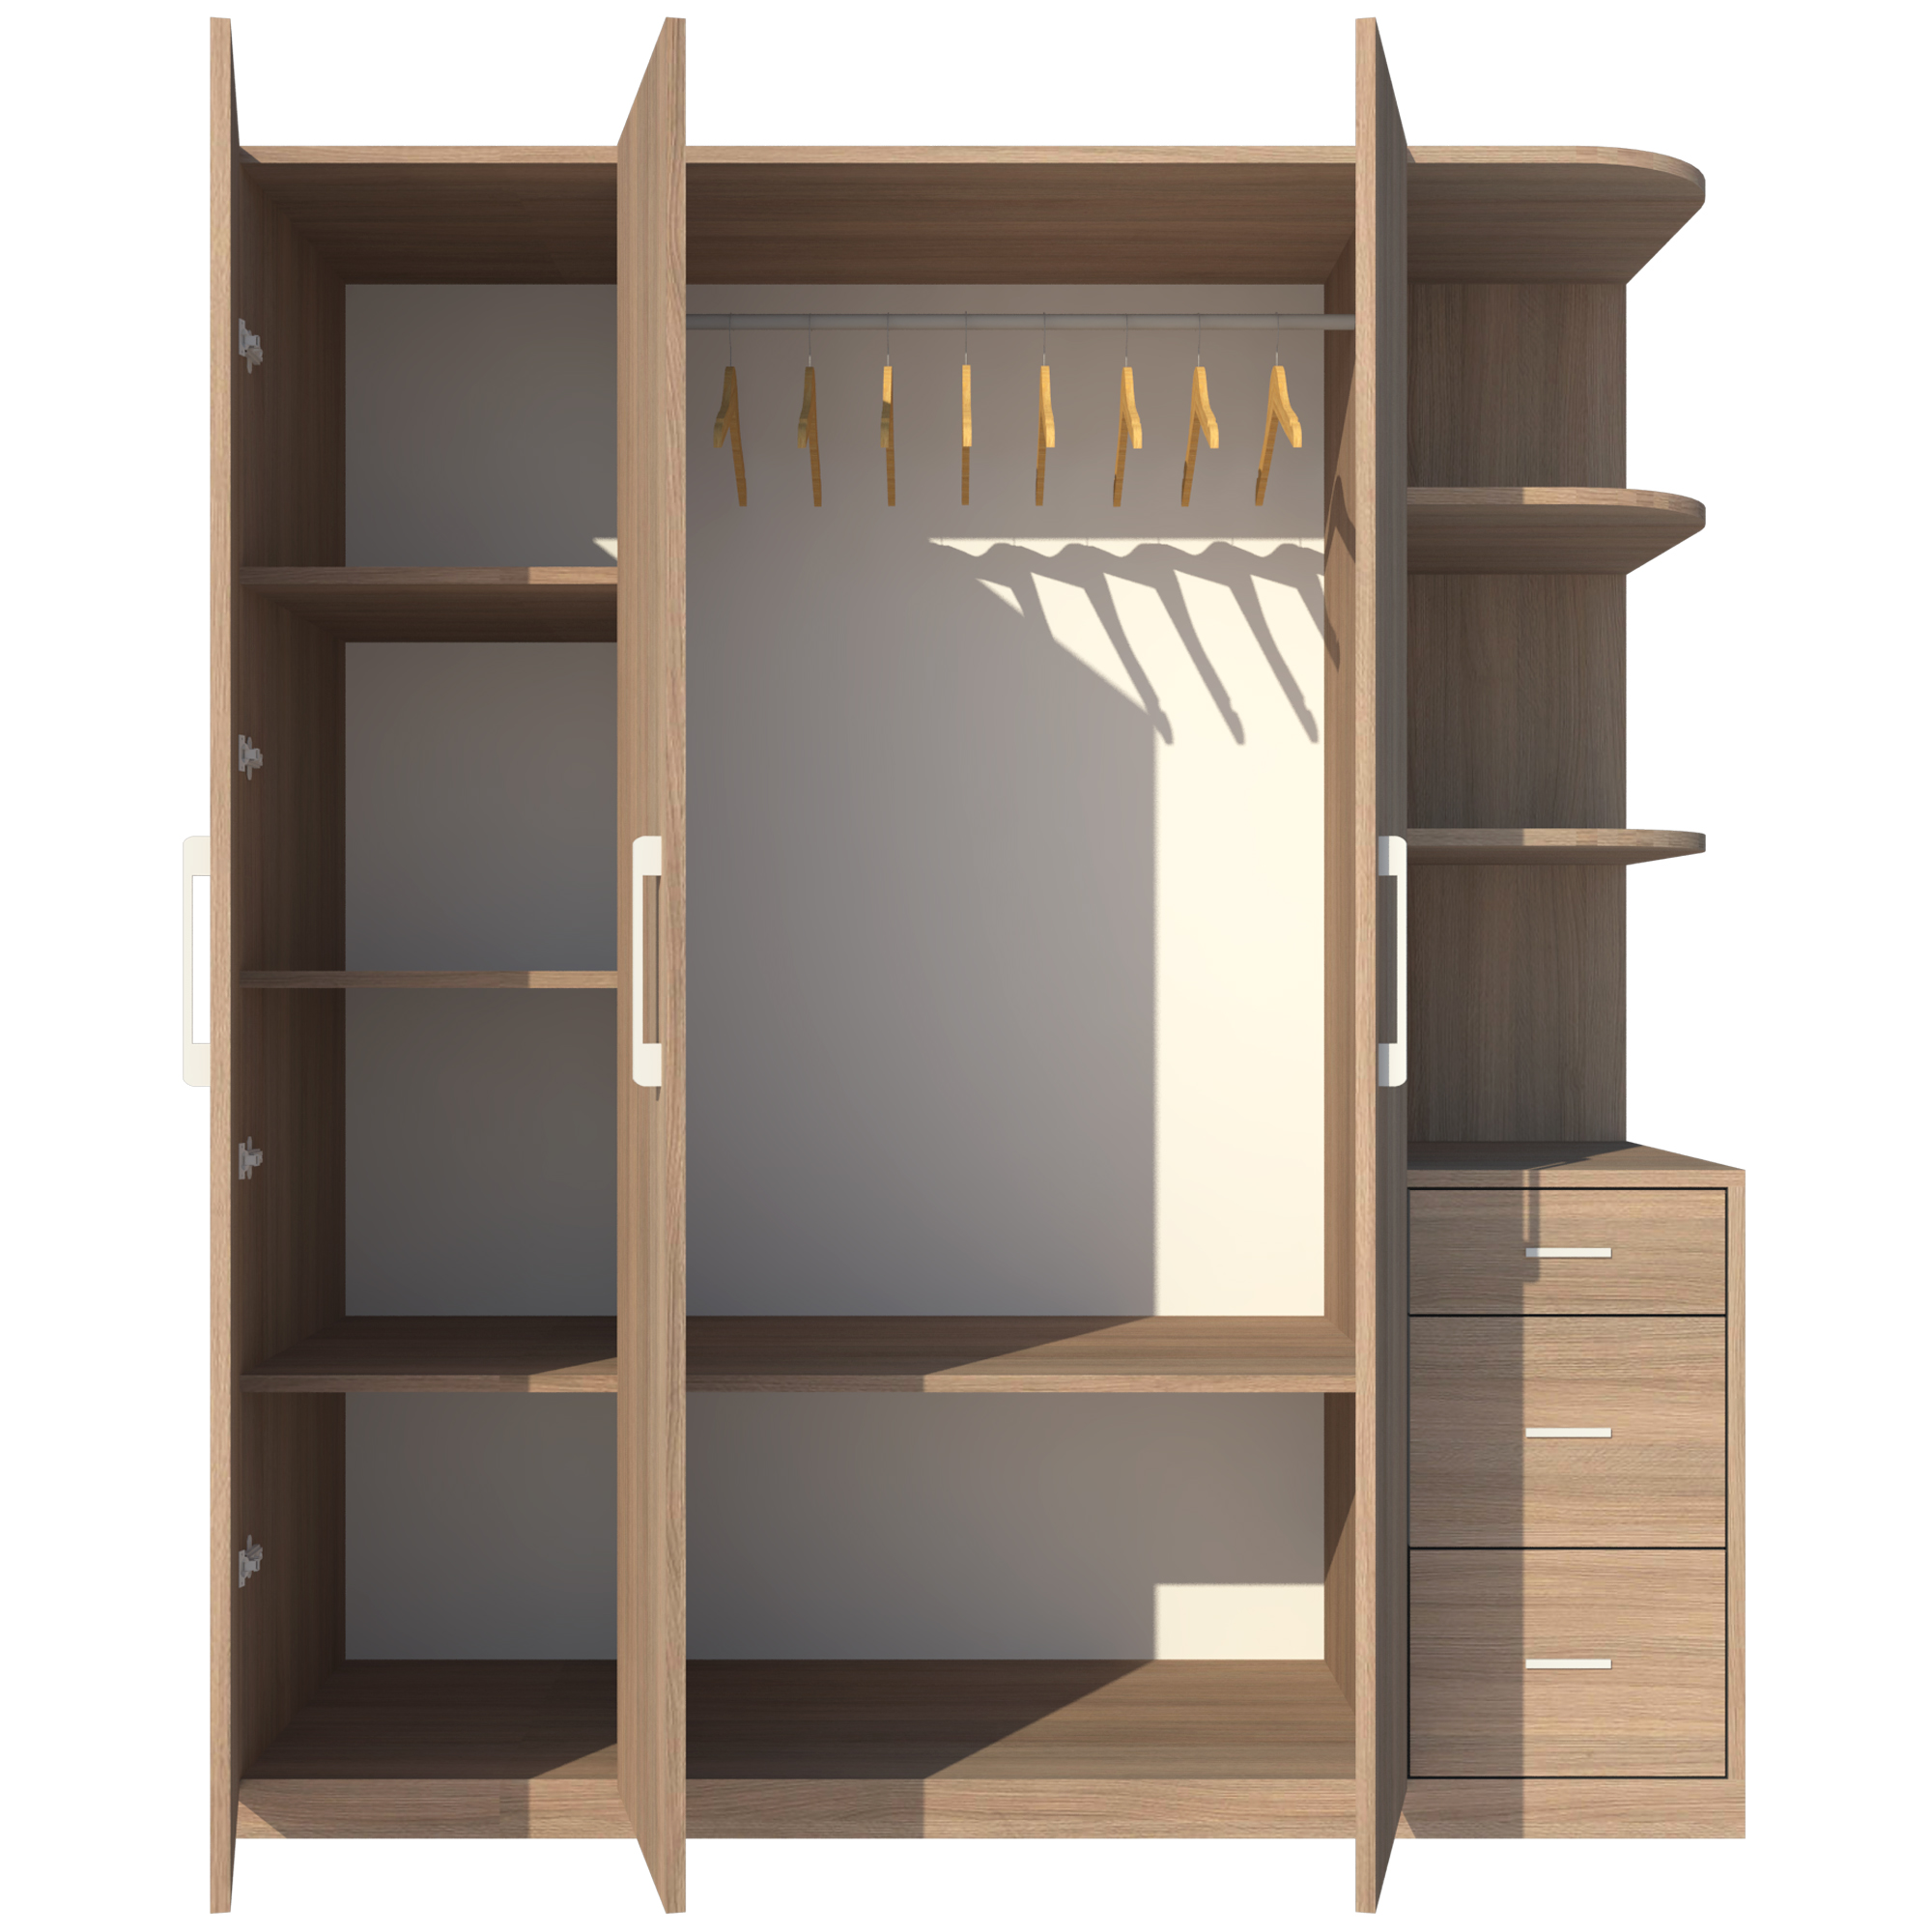 Tủ Áo FINE FT058 (180cm x 200cm)